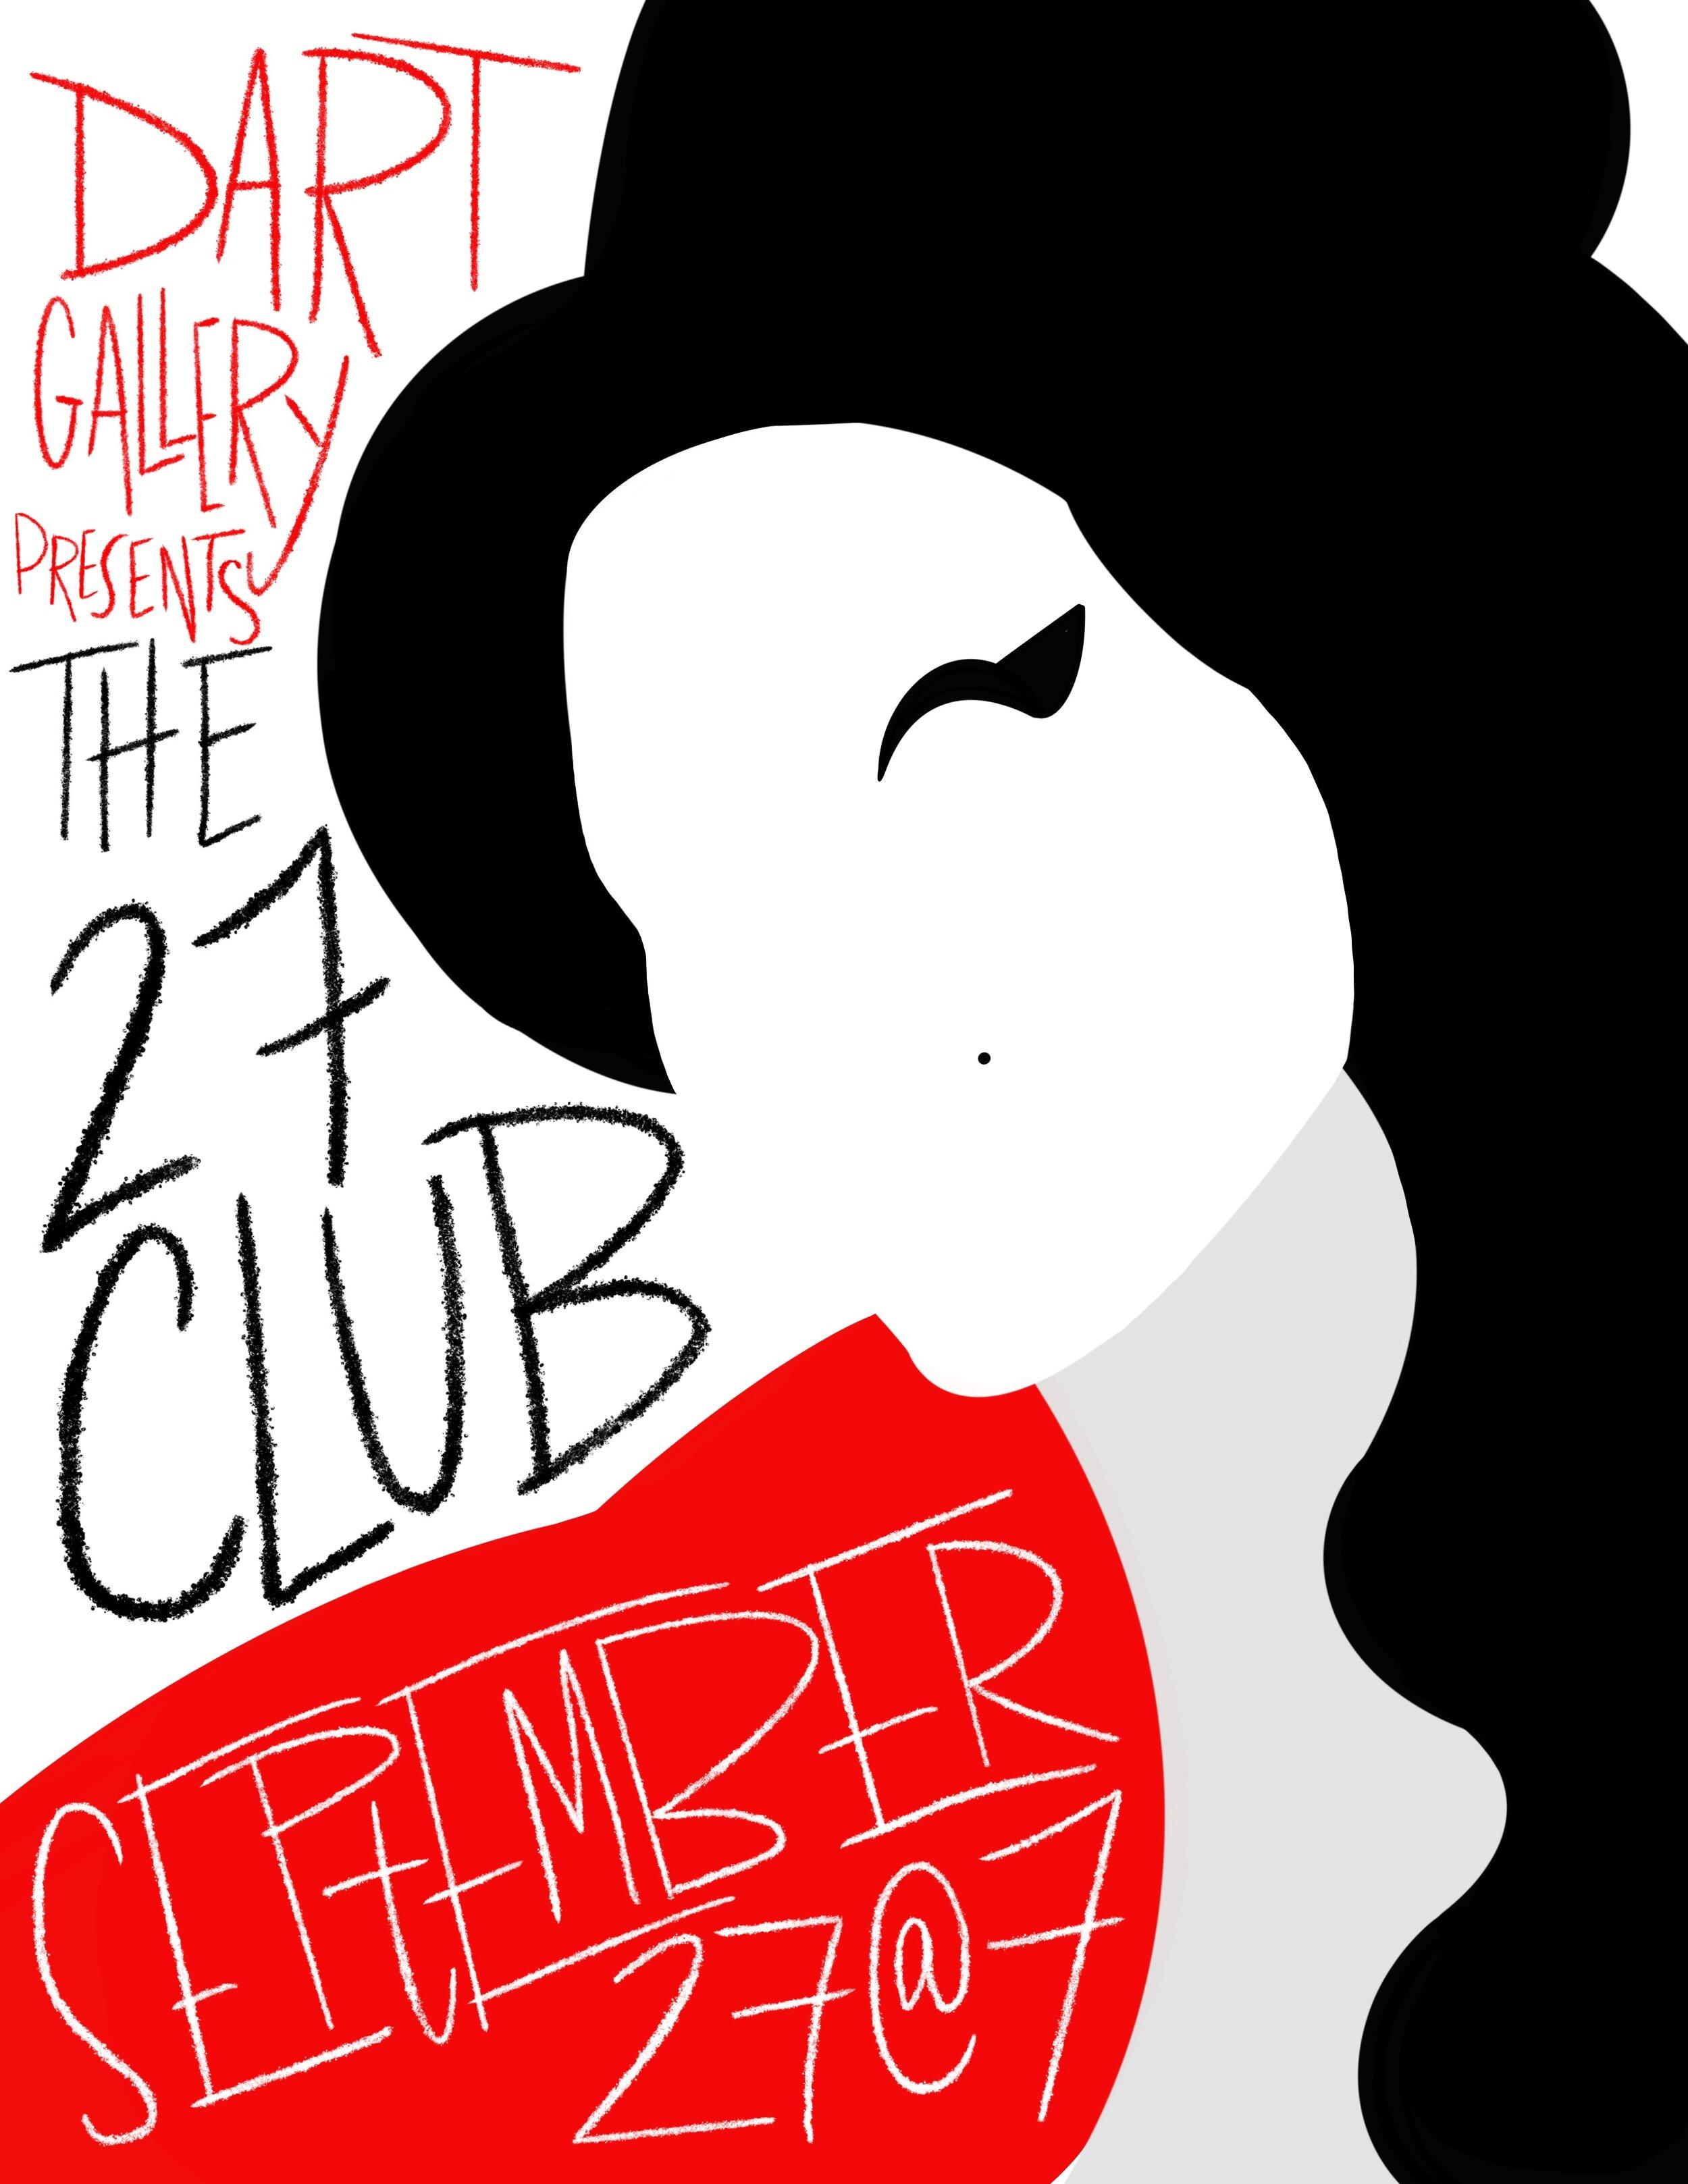 27 club poster.jpeg